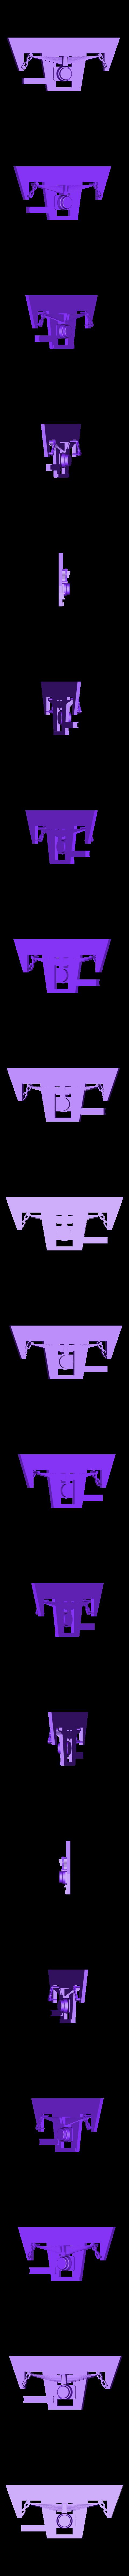 G boite essieu1.STL Download STL file Draisine Matisa for LGB • 3D printable object, biddle